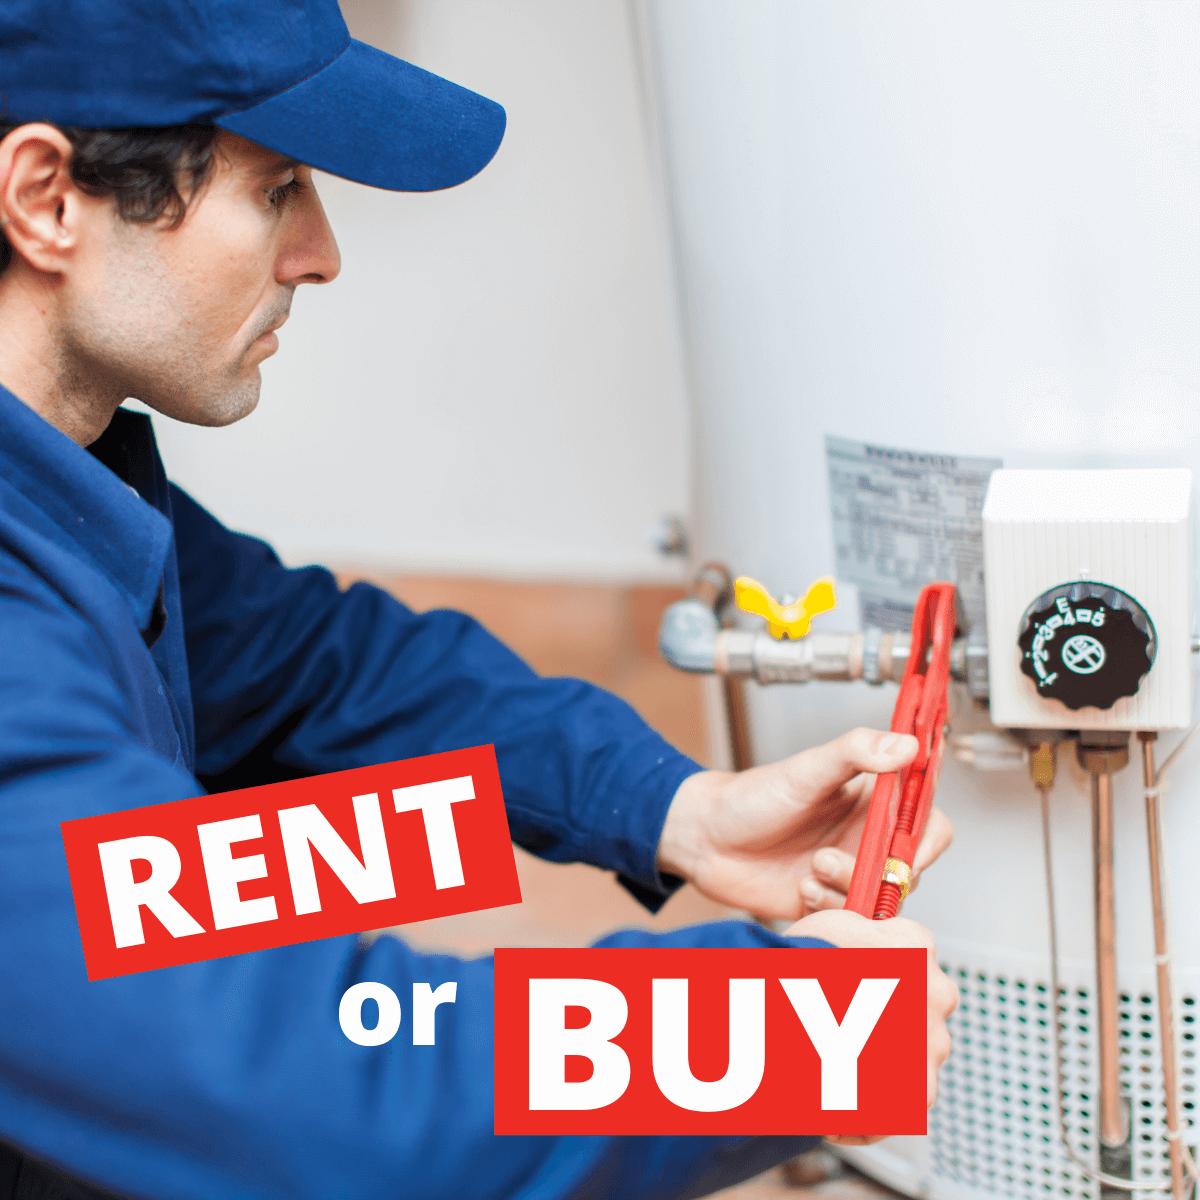 How Water Heater Rental Companies Screw Canadians